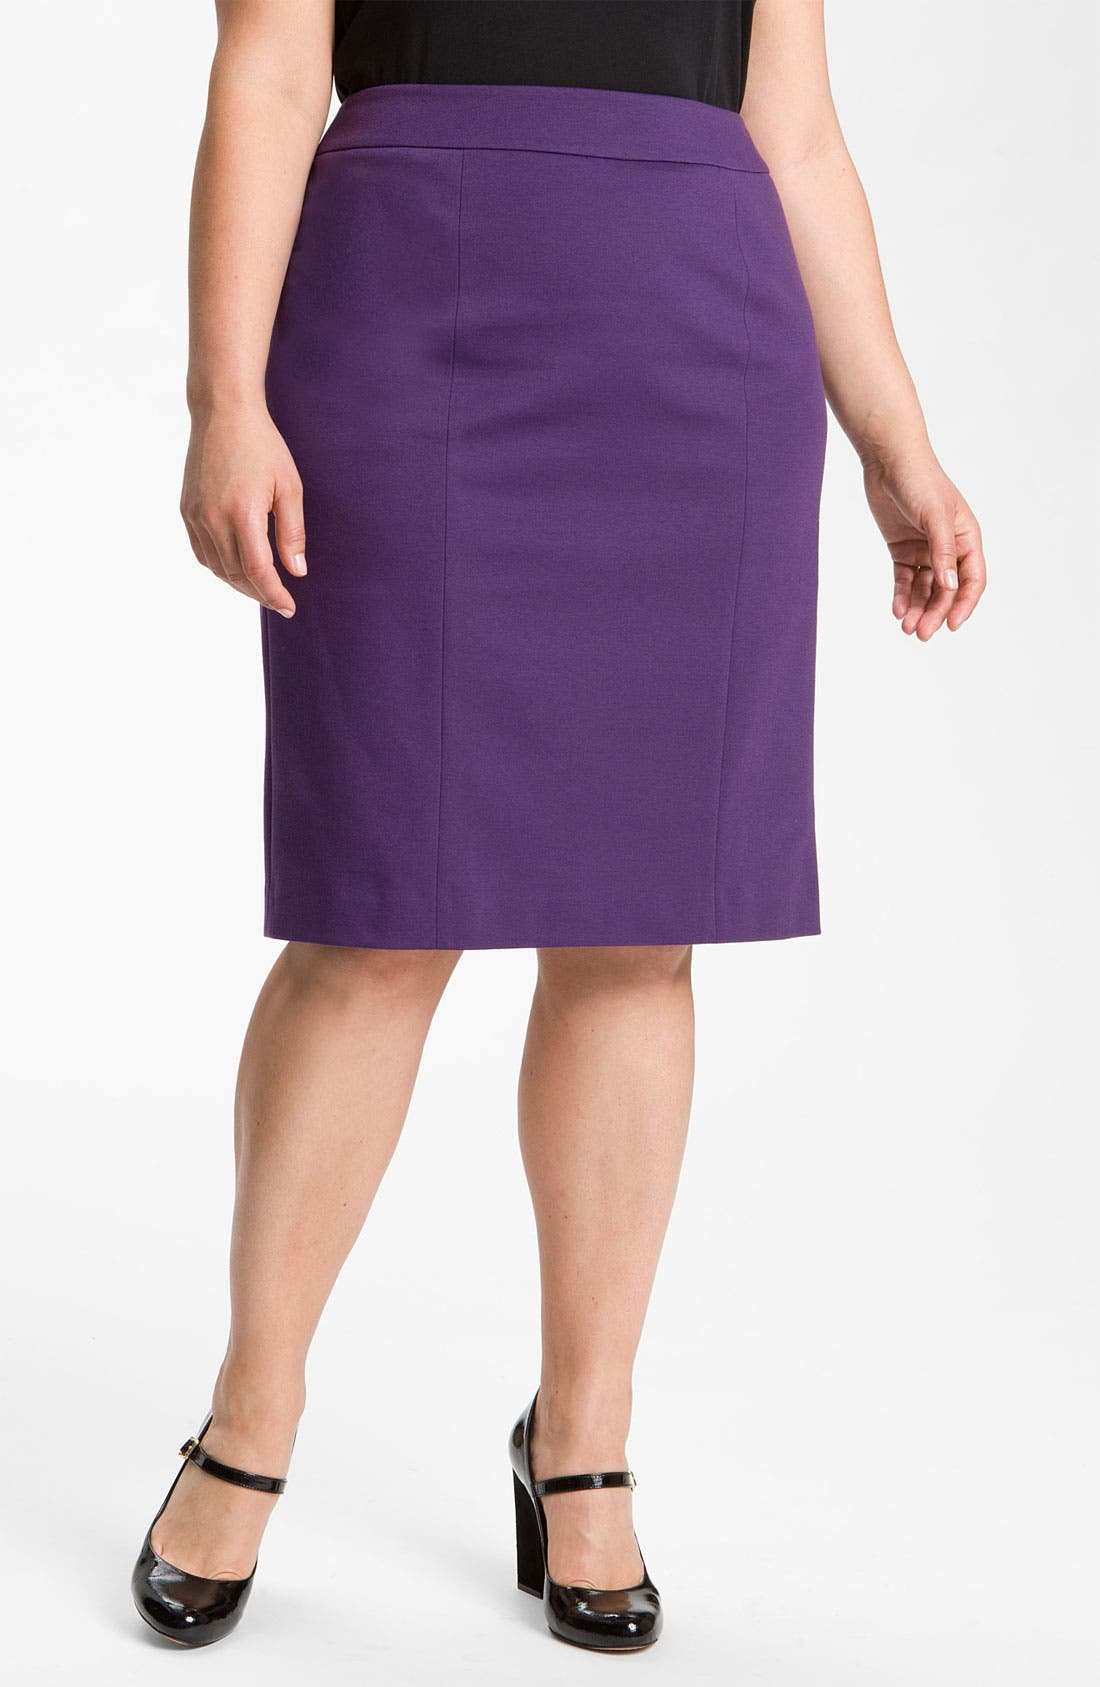 Alternate Image 1 Selected - Sejour Ponte Knit Skirt (Plus)